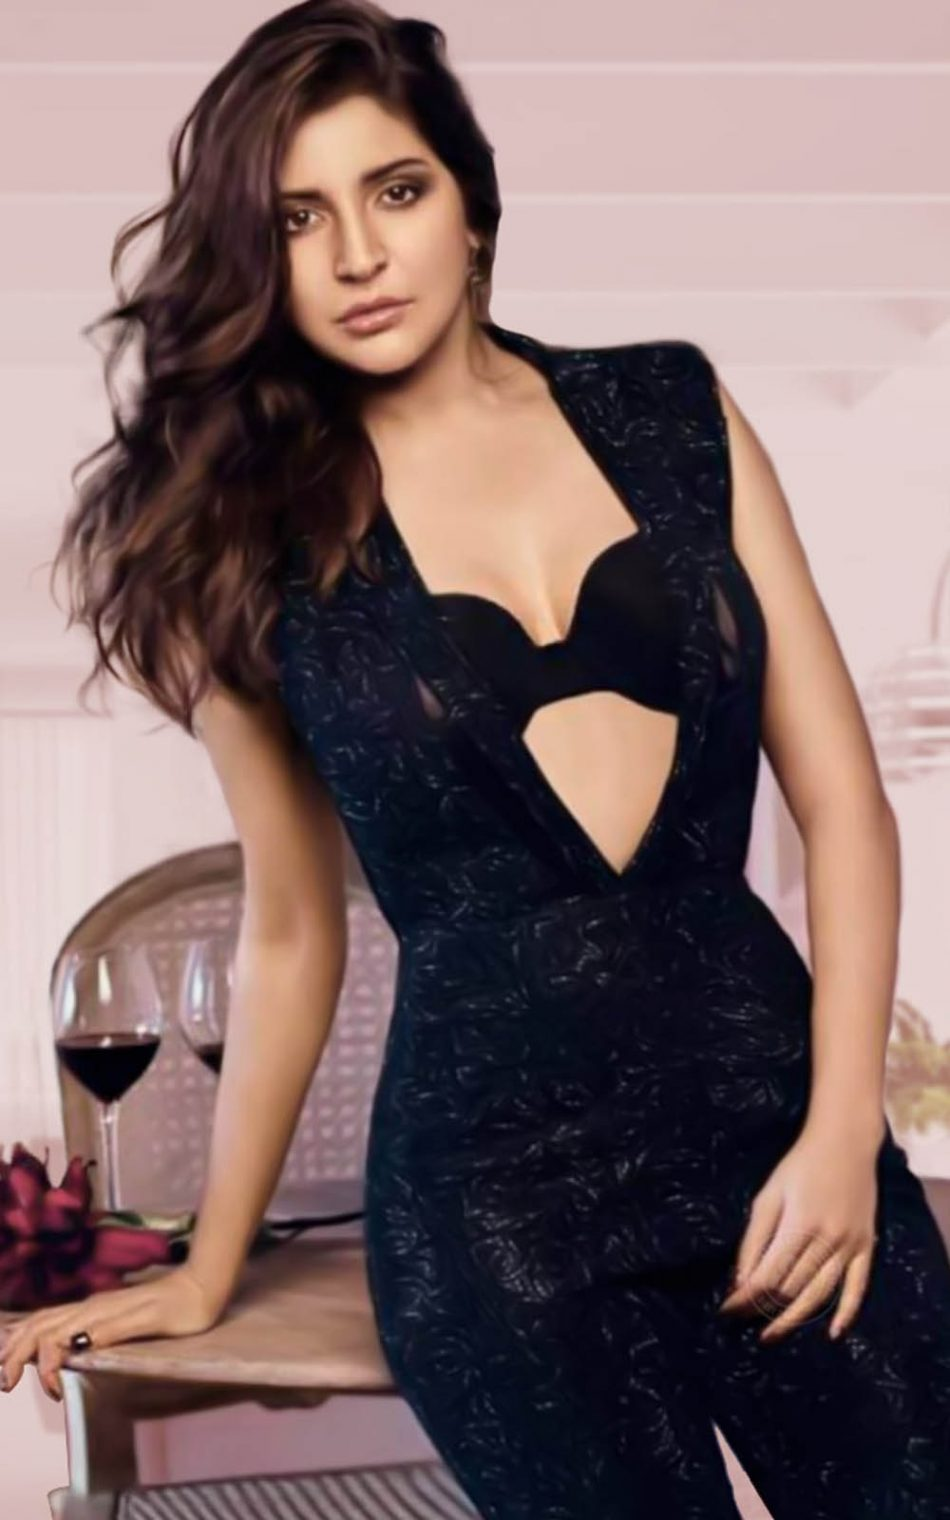 Anushka Sharma In Black Dress HD Mobile Wallpaper